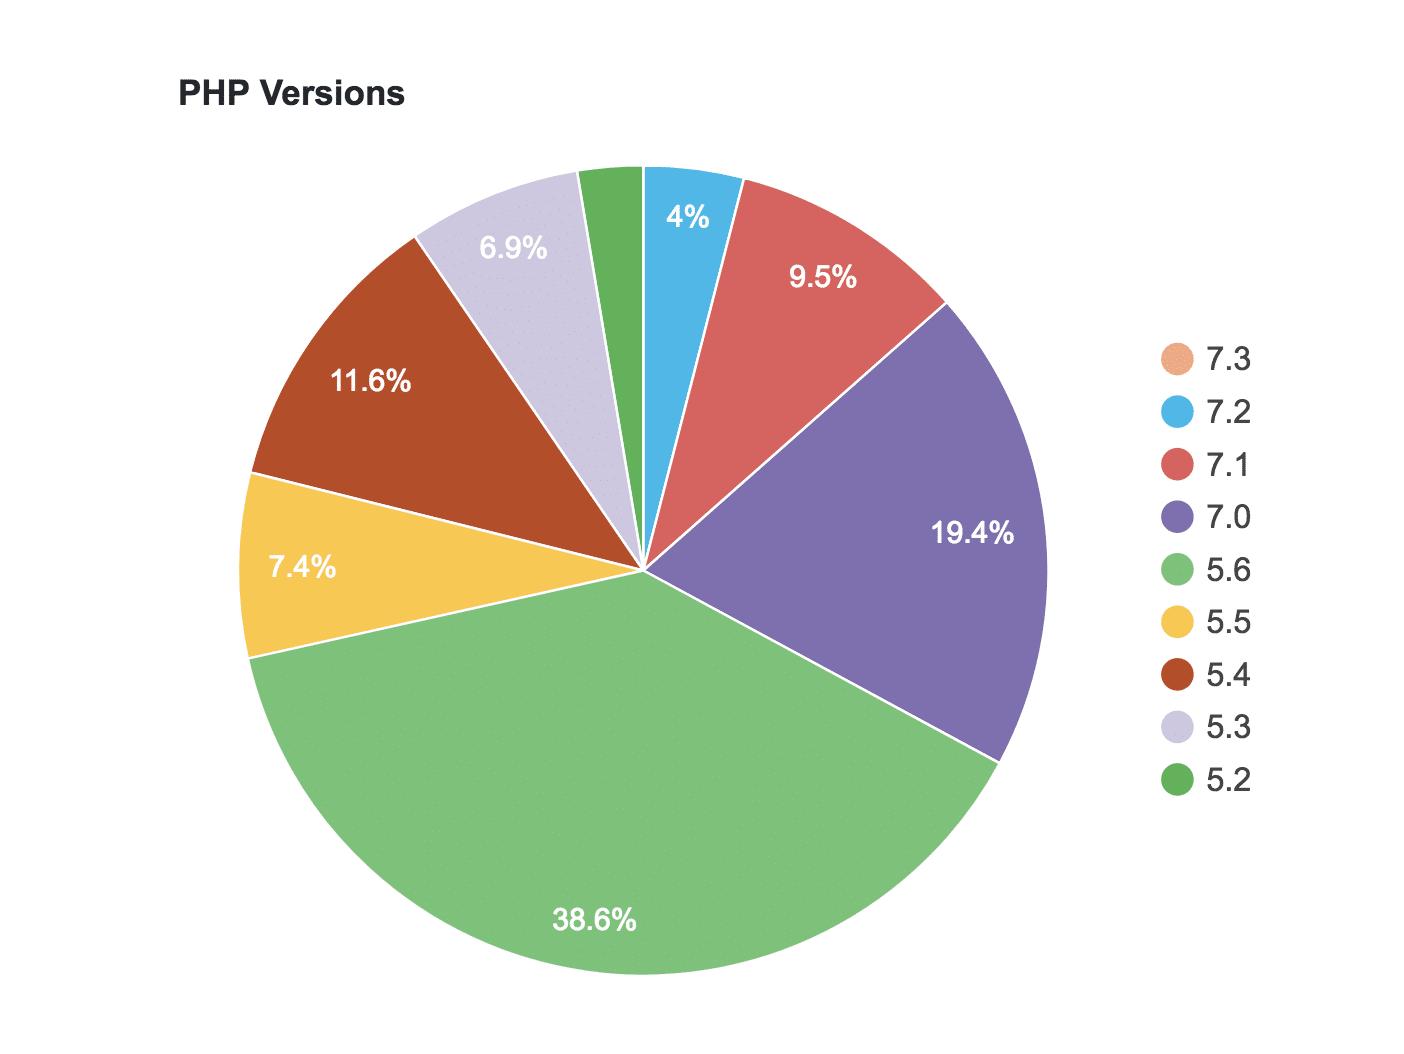 WordPressにての各PHPバージョンの使用率